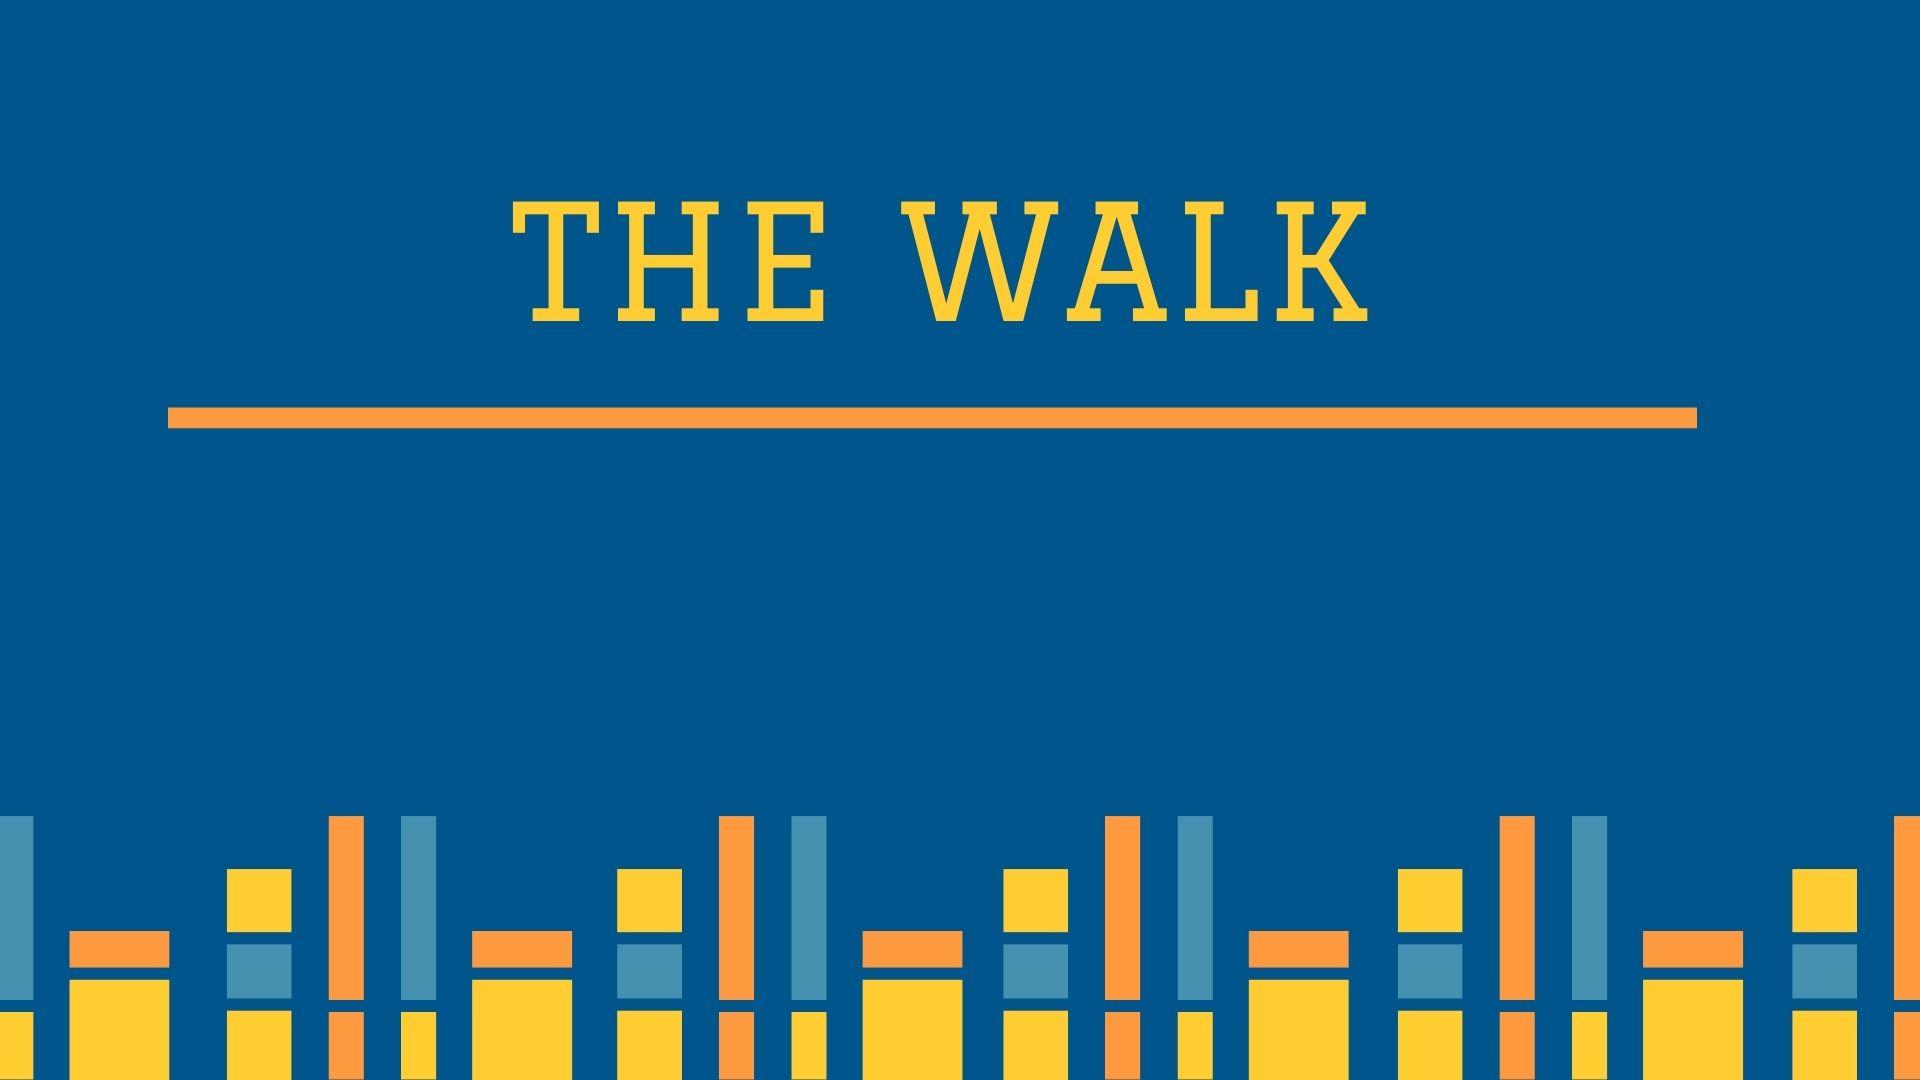 The Walk (1)